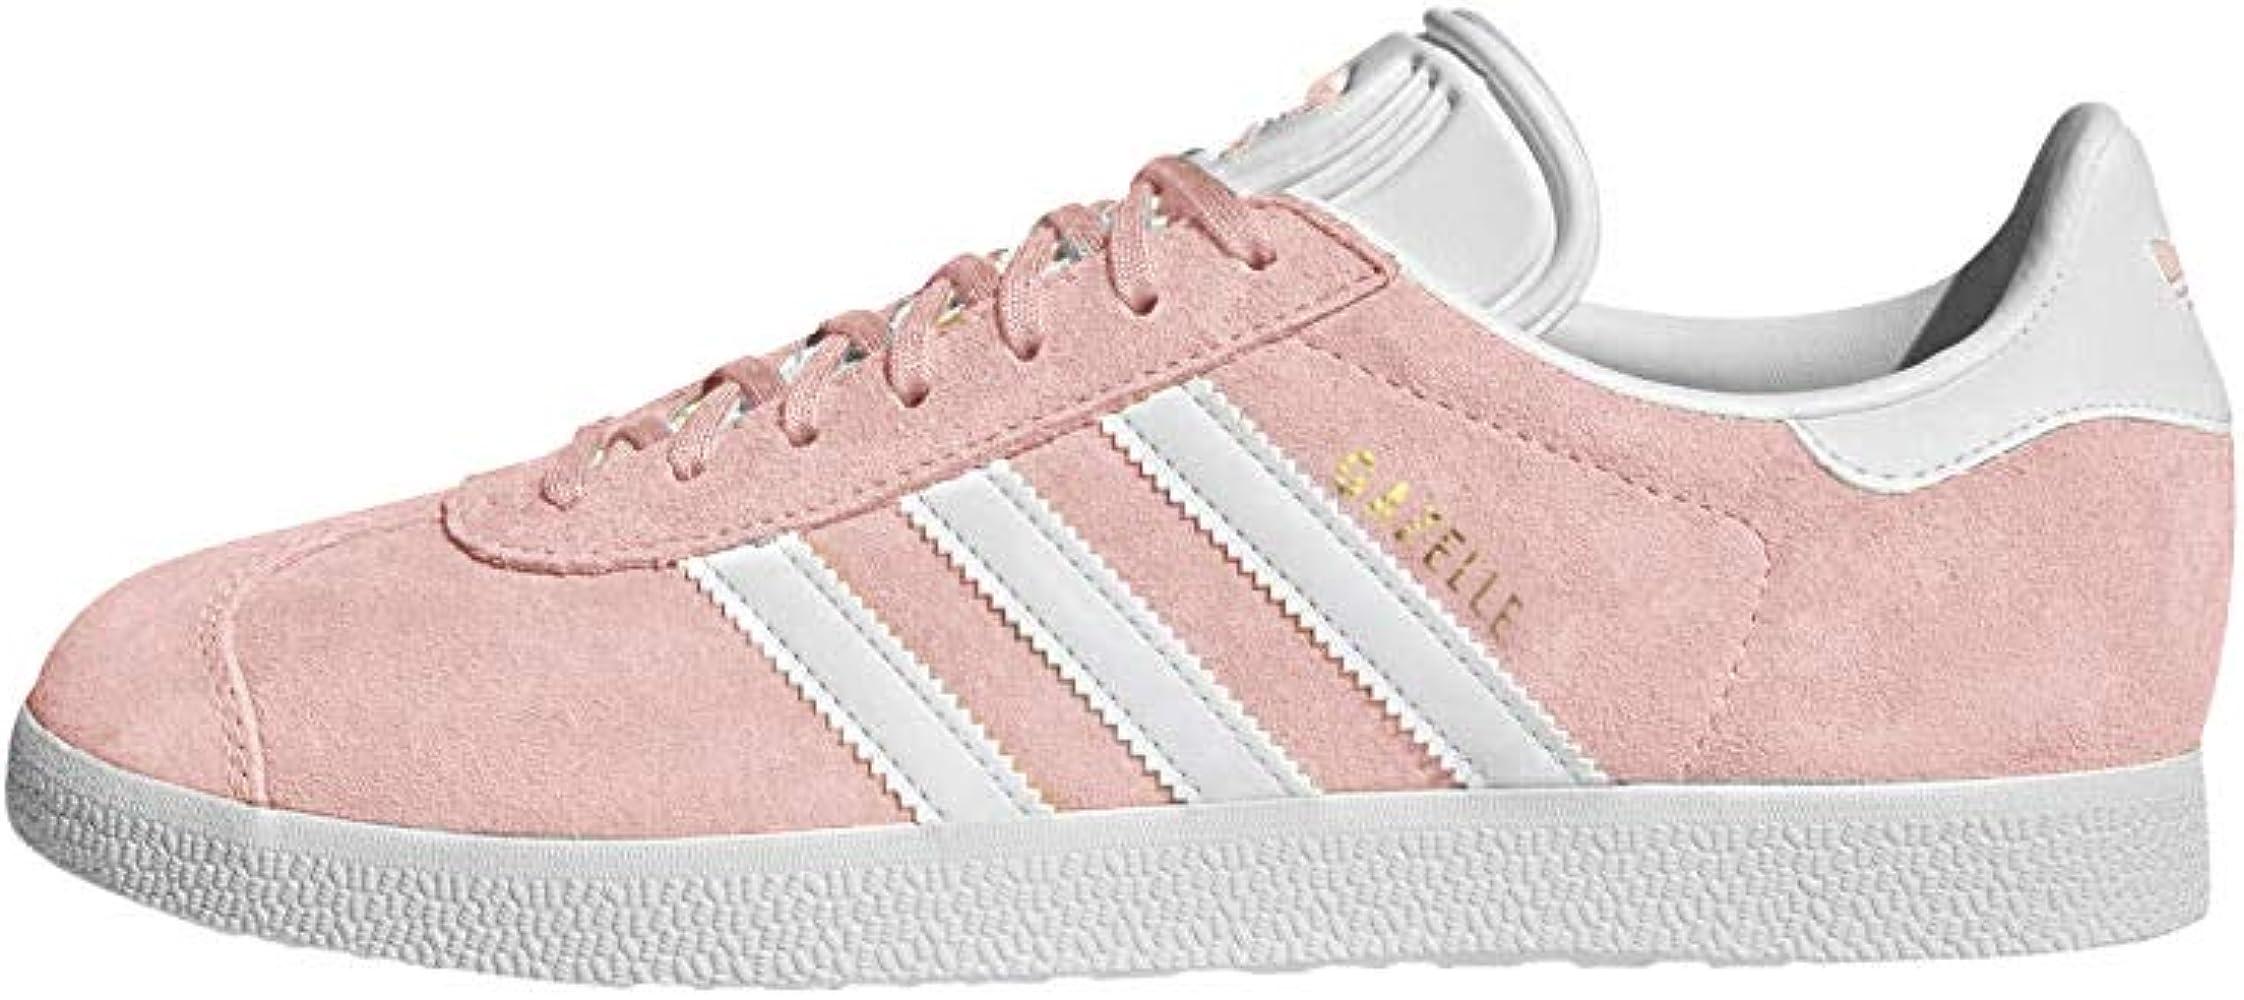 adidas Originals Kid's Gazelle Sneaker